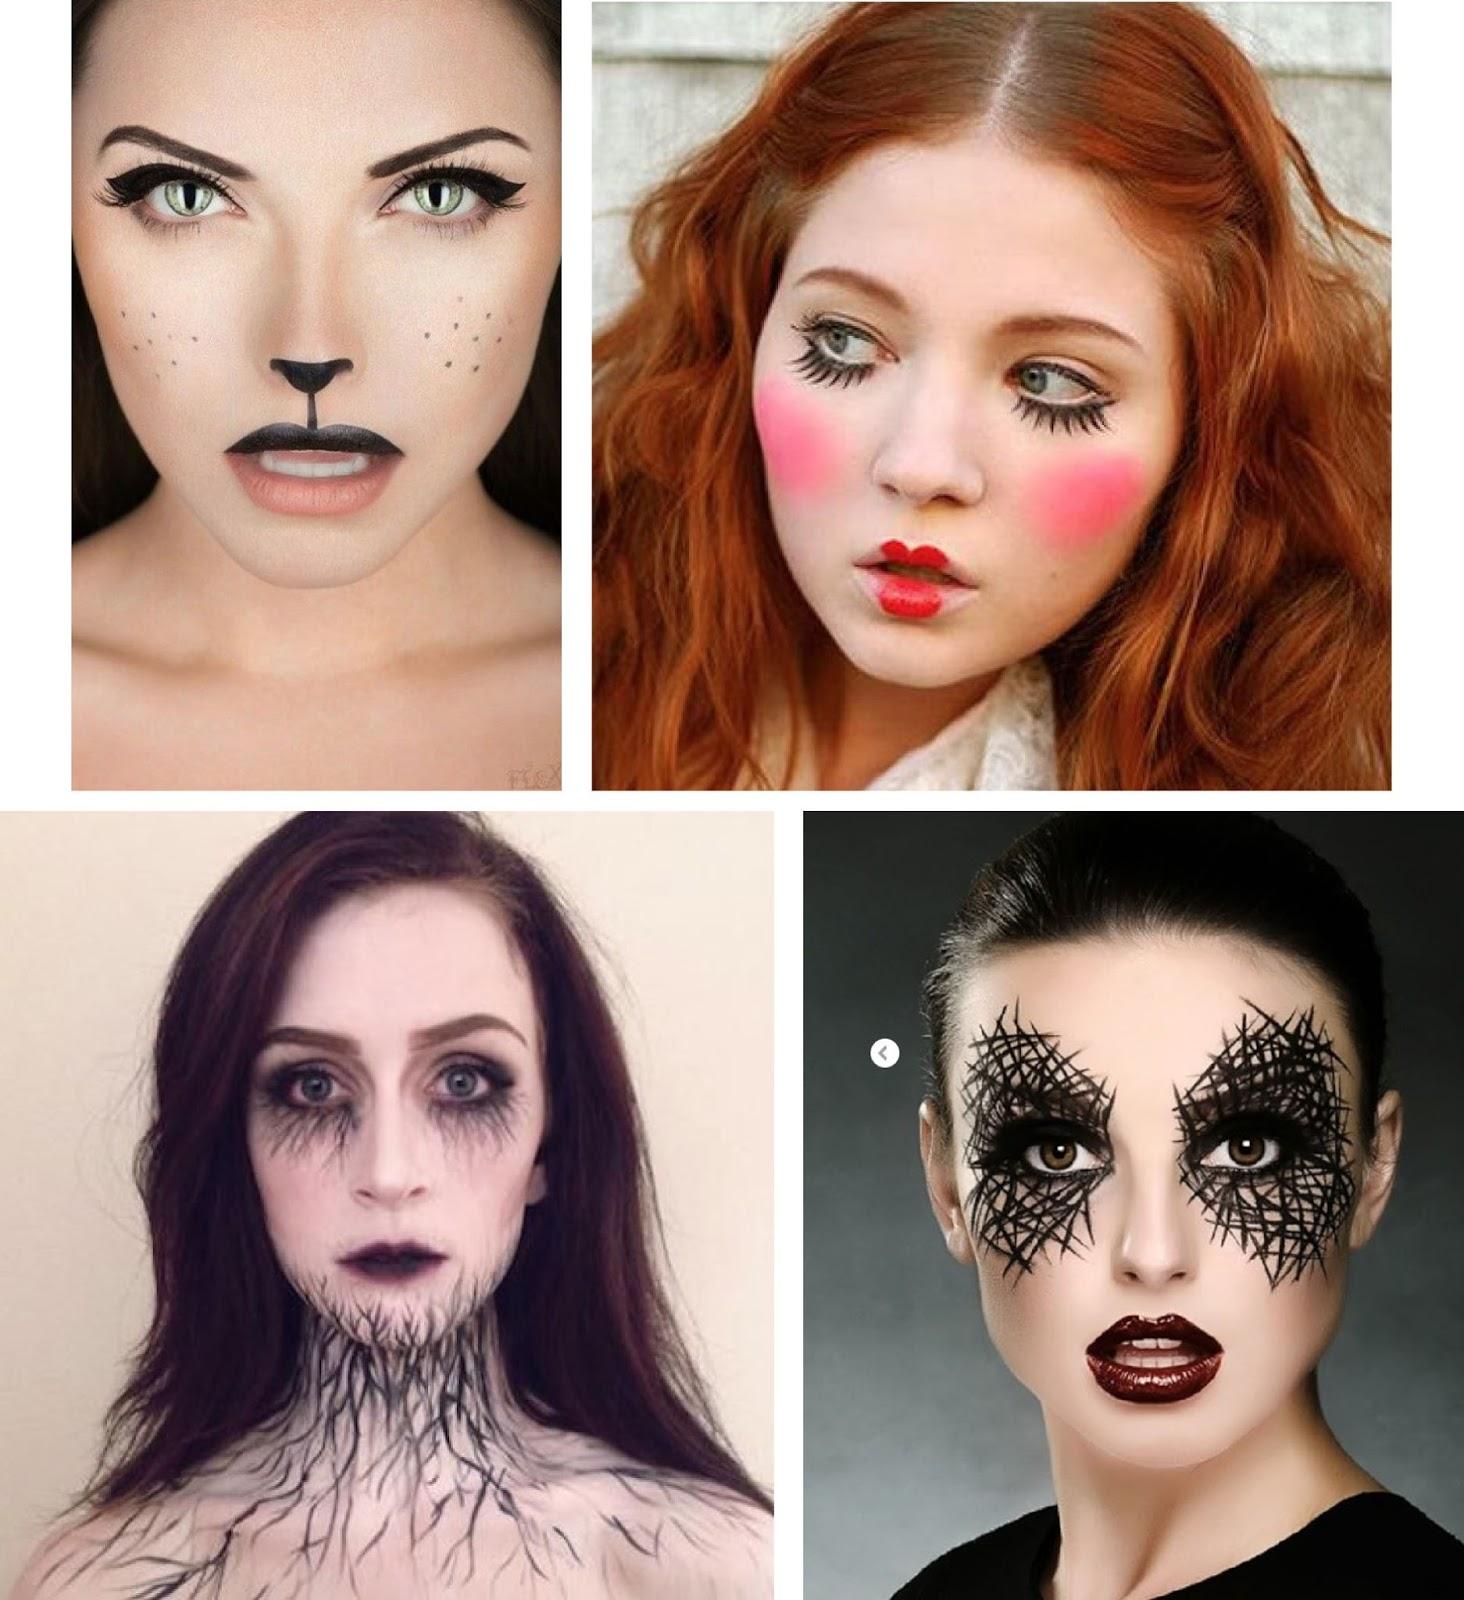 Halloween Looks With Everyday Makeup.Everydayamy Pinterest Last Minute Halloween Looks For Lazy